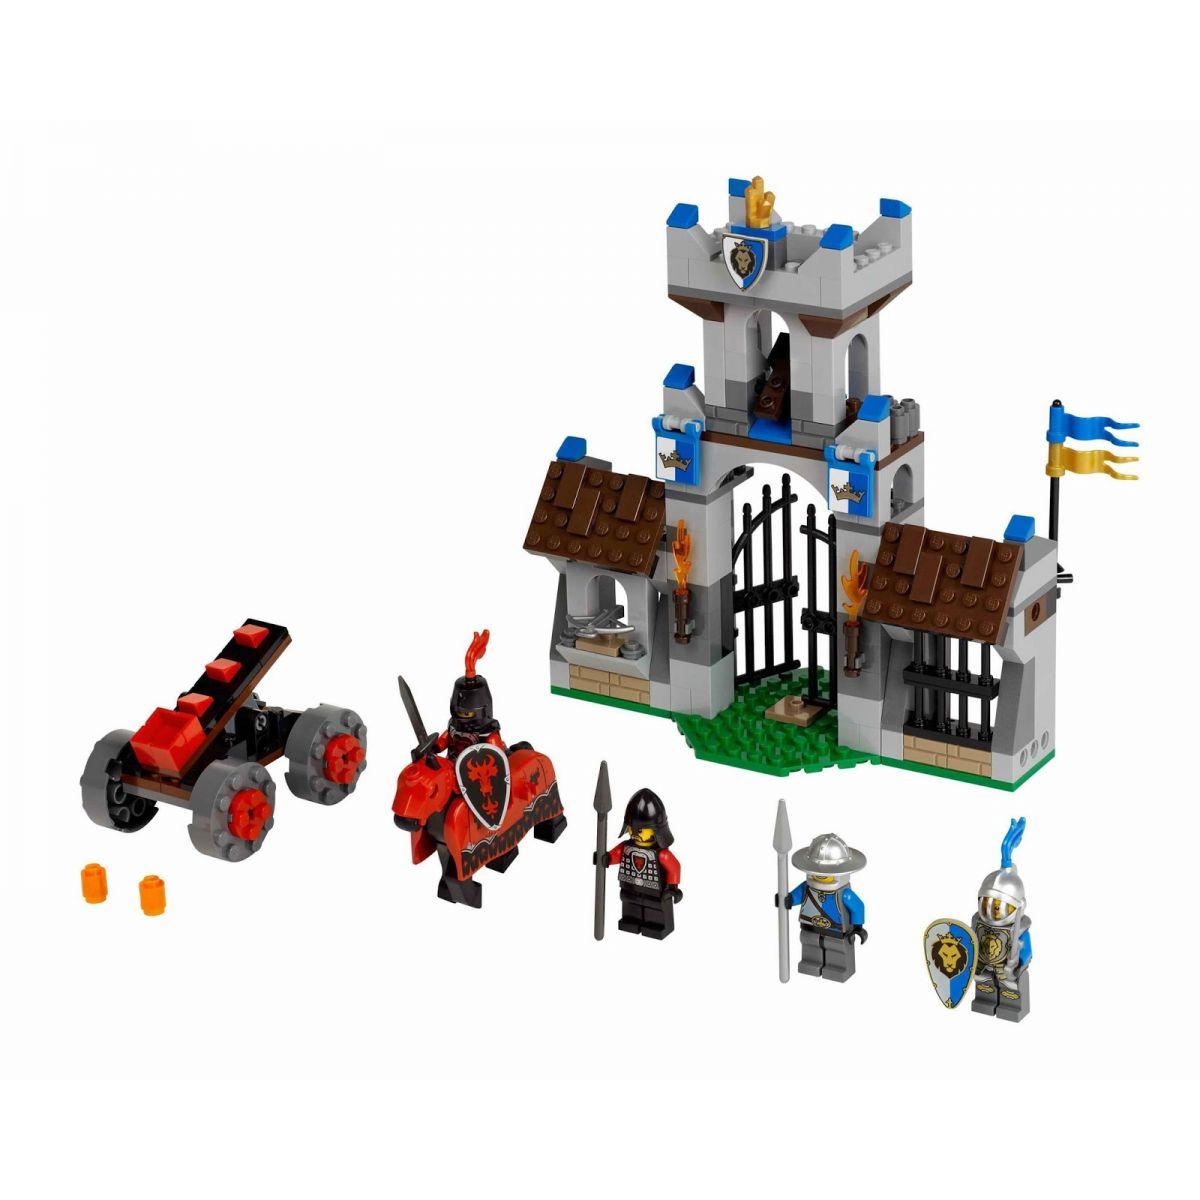 Lego Castle - A Invasão do Forte - Ref: 70402  - Hobby Lobby CollectorStore